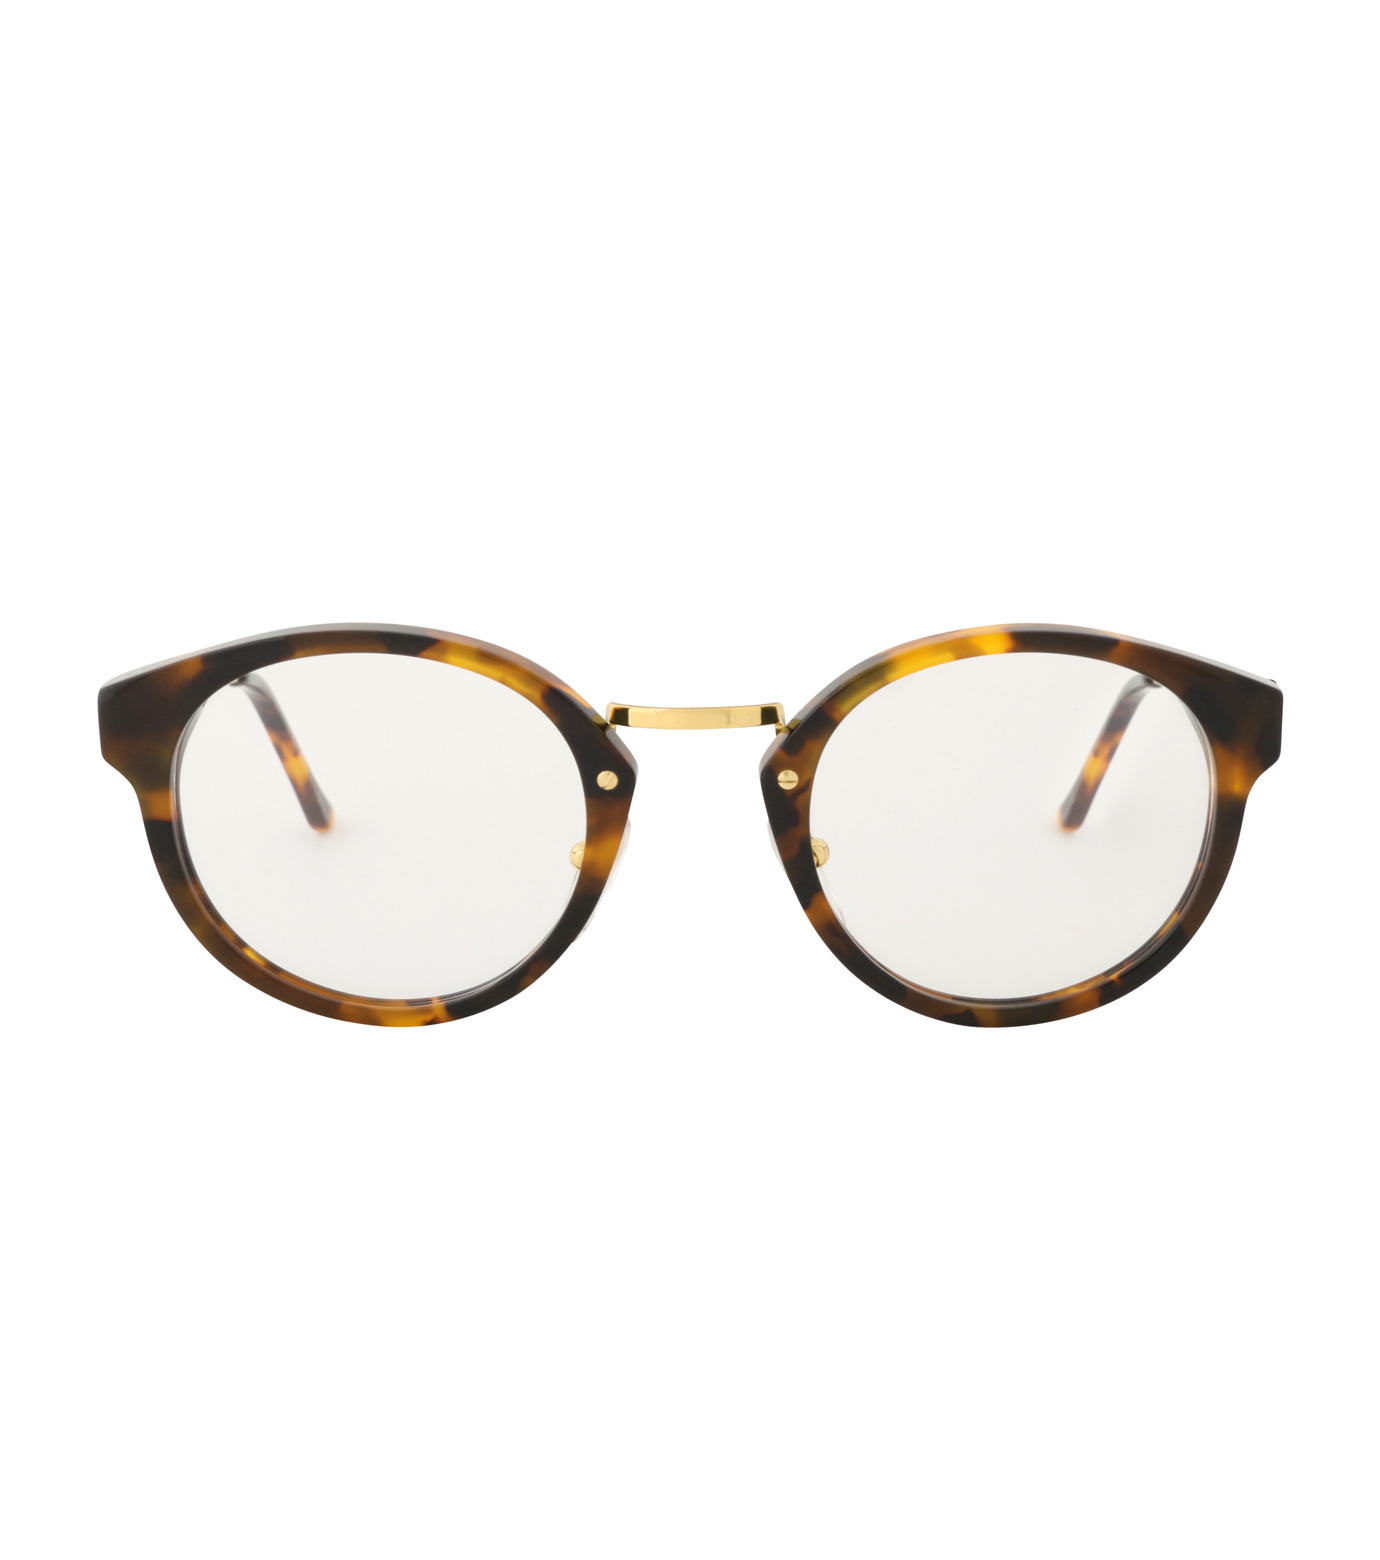 SUPER(スーパー)のPANAMA HAVANA CLASSIC CLEAR LENS-BROWN(アイウェア/eyewear)-SPRXXXX055-42 拡大詳細画像3